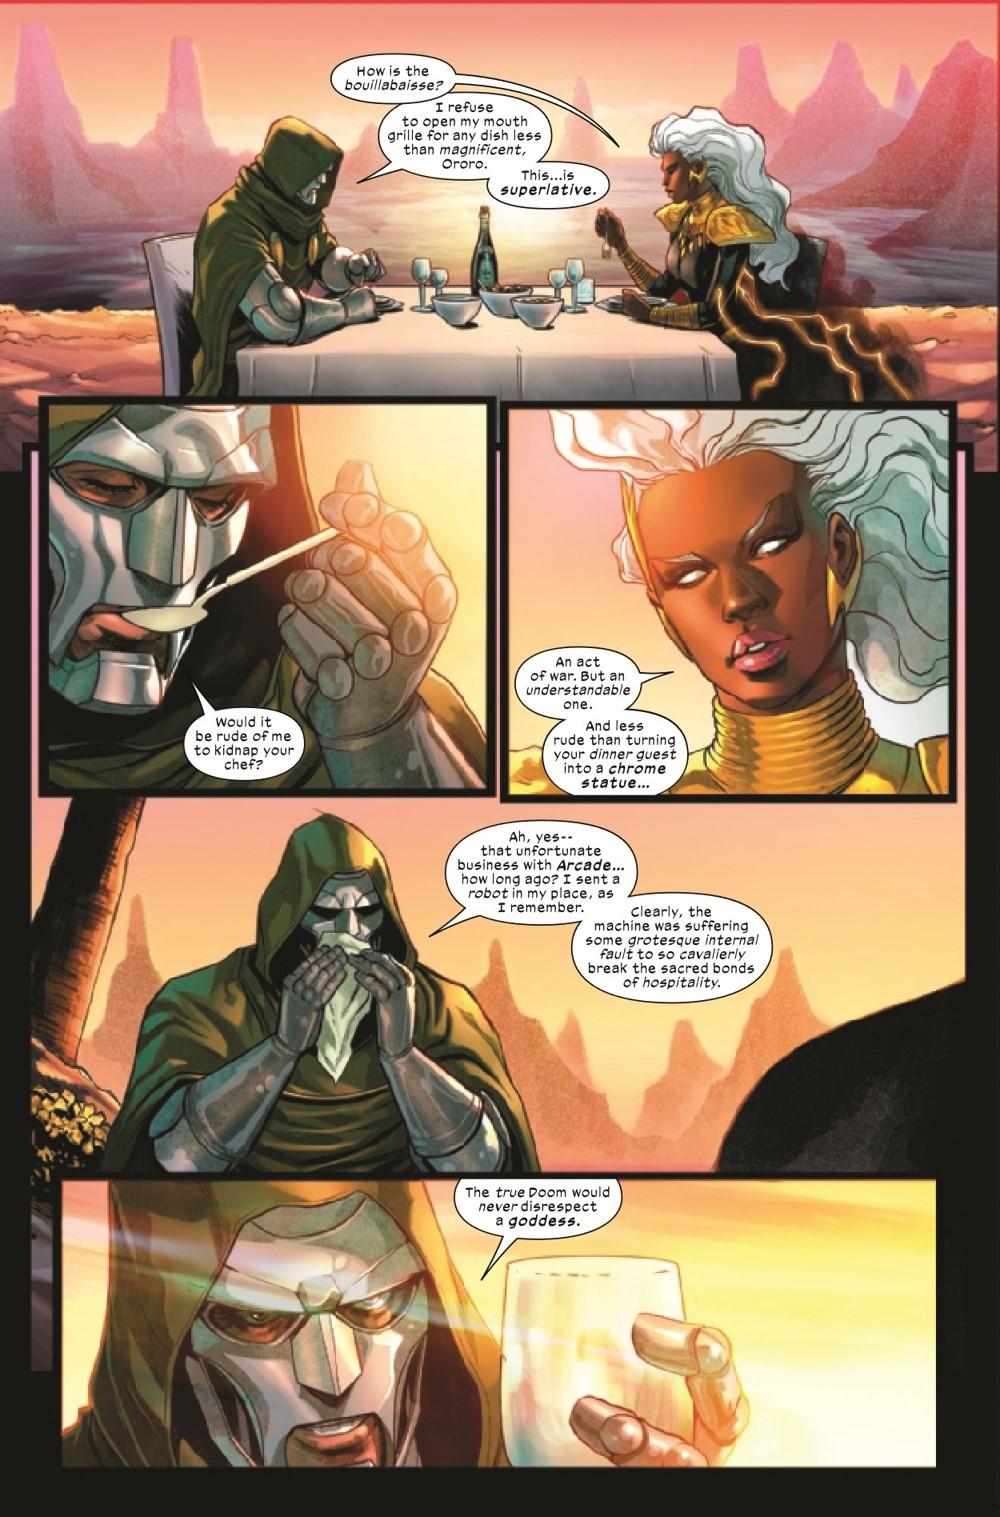 SWORD2020007_Preview-3 ComicList Previews: S.W.O.R.D. #7